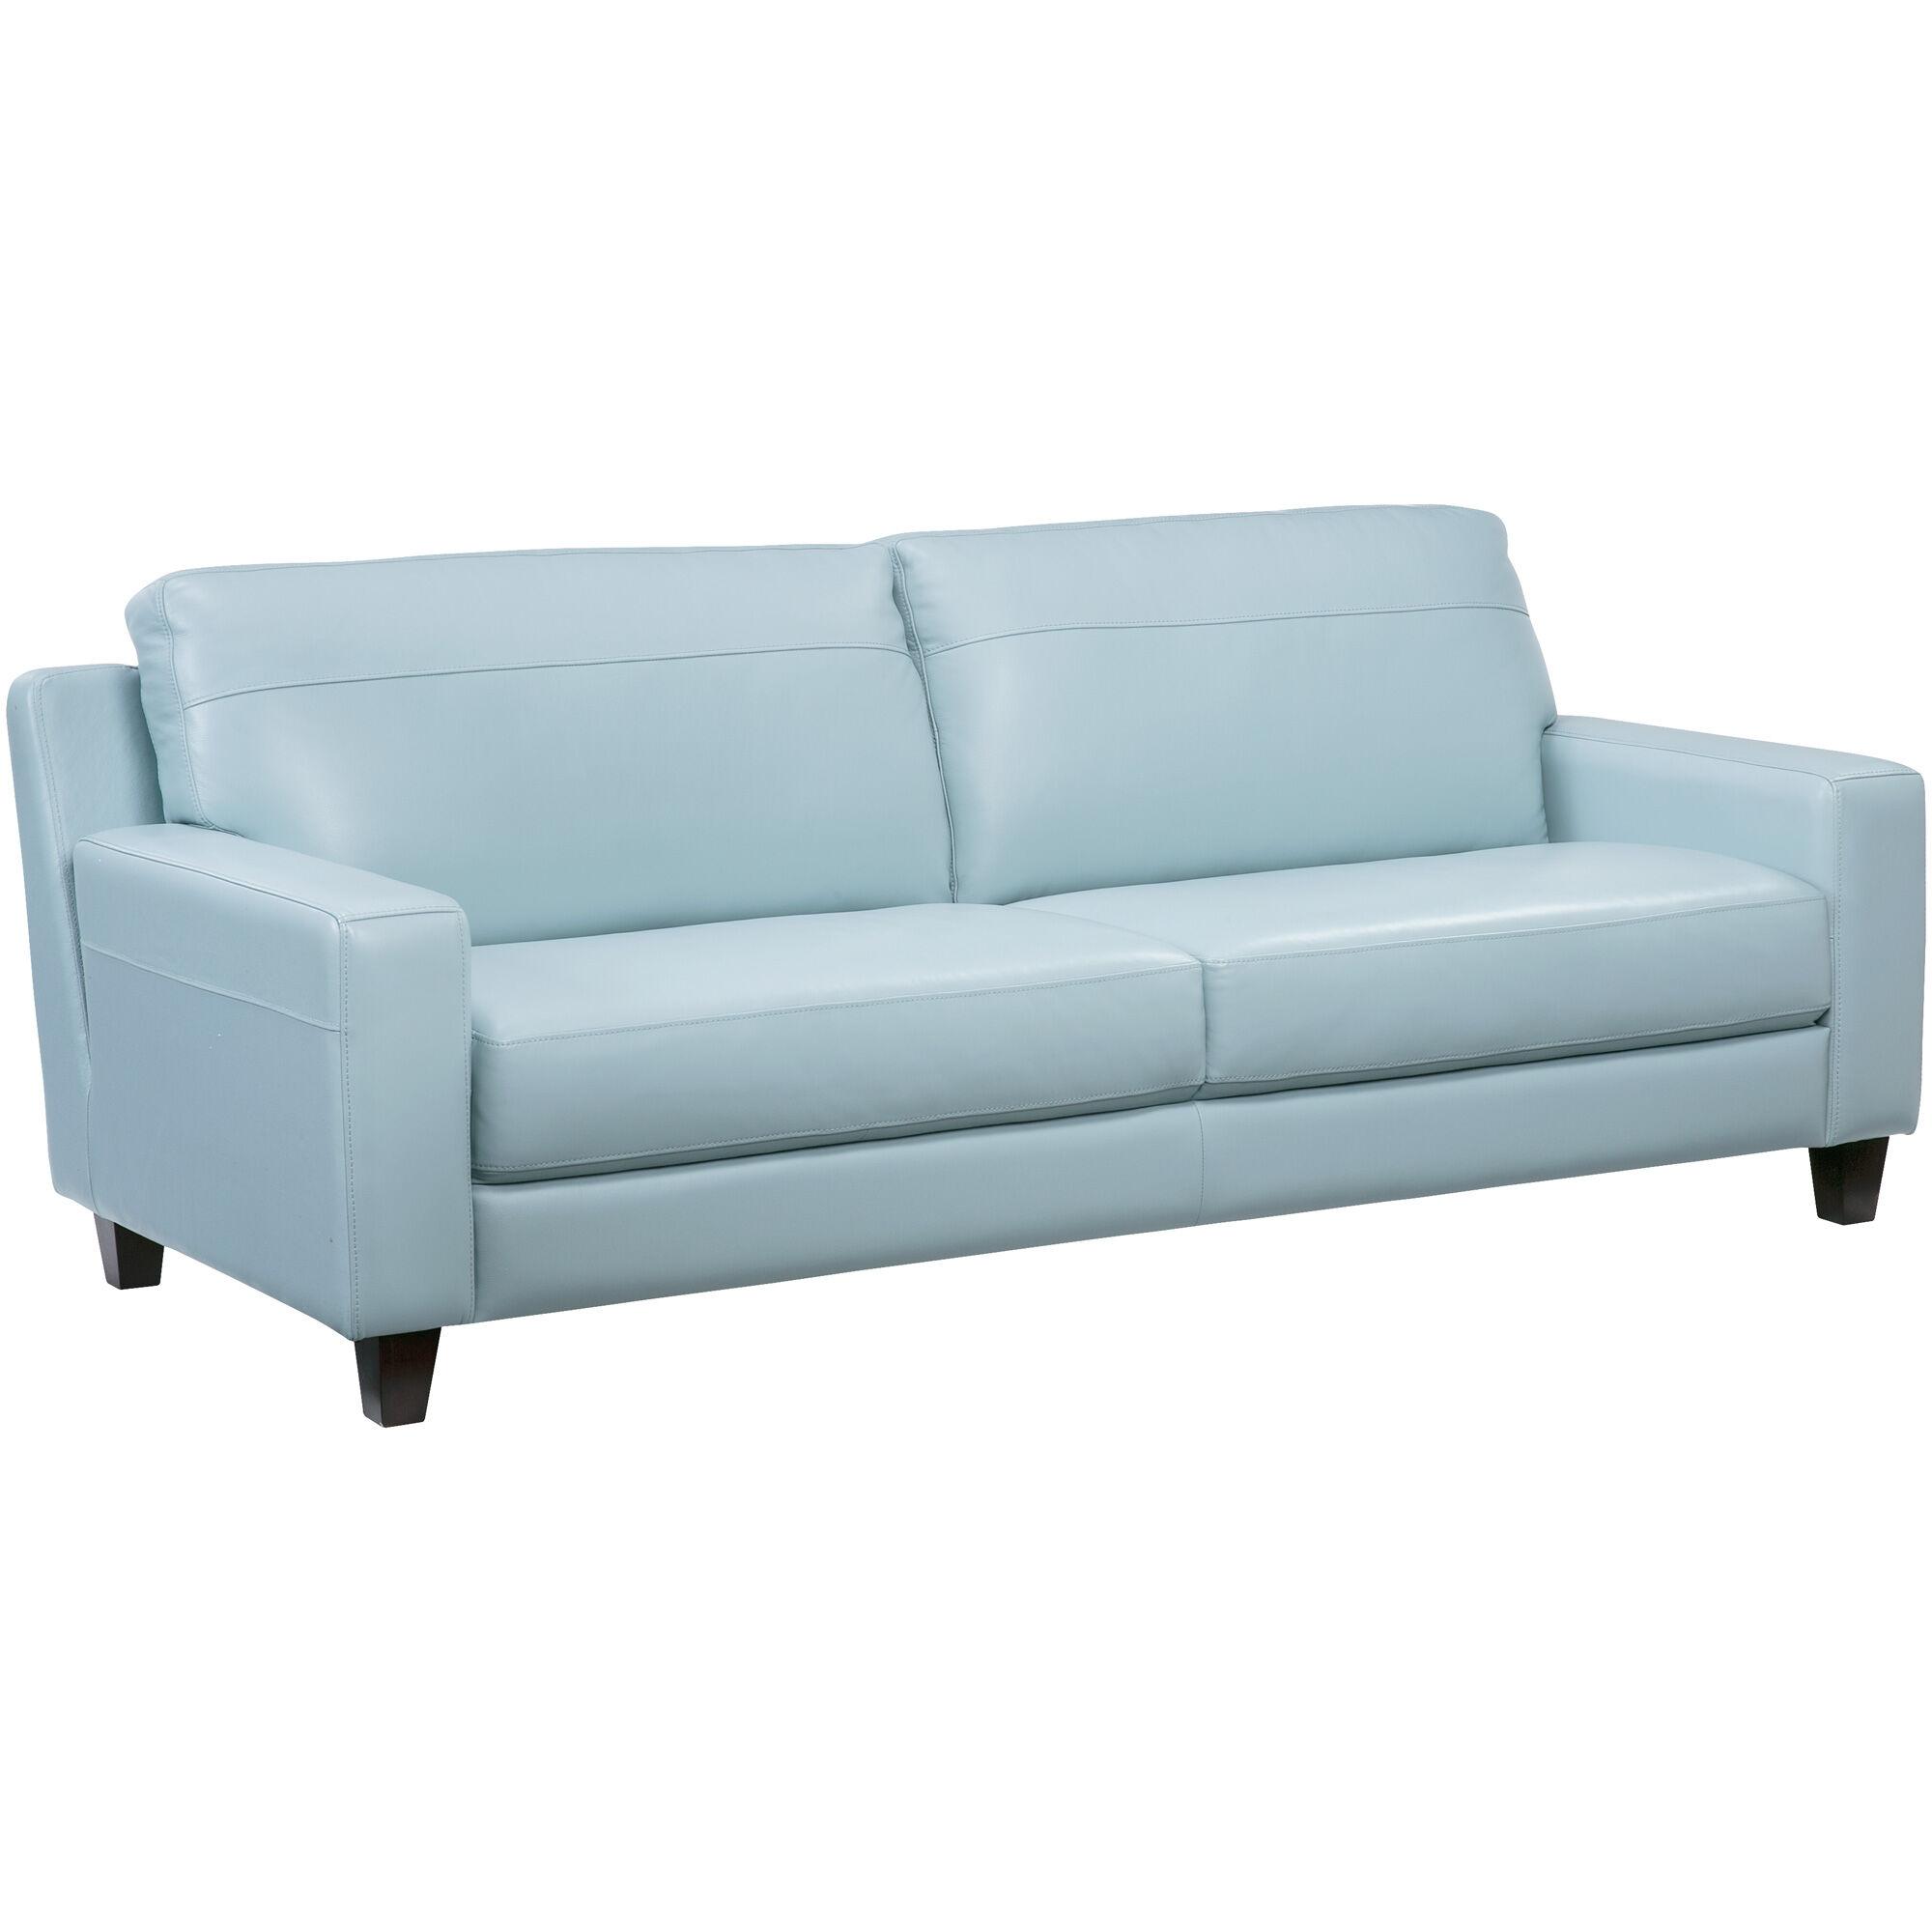 aqua sofa black gumtree glasgow slumberland furniture fender